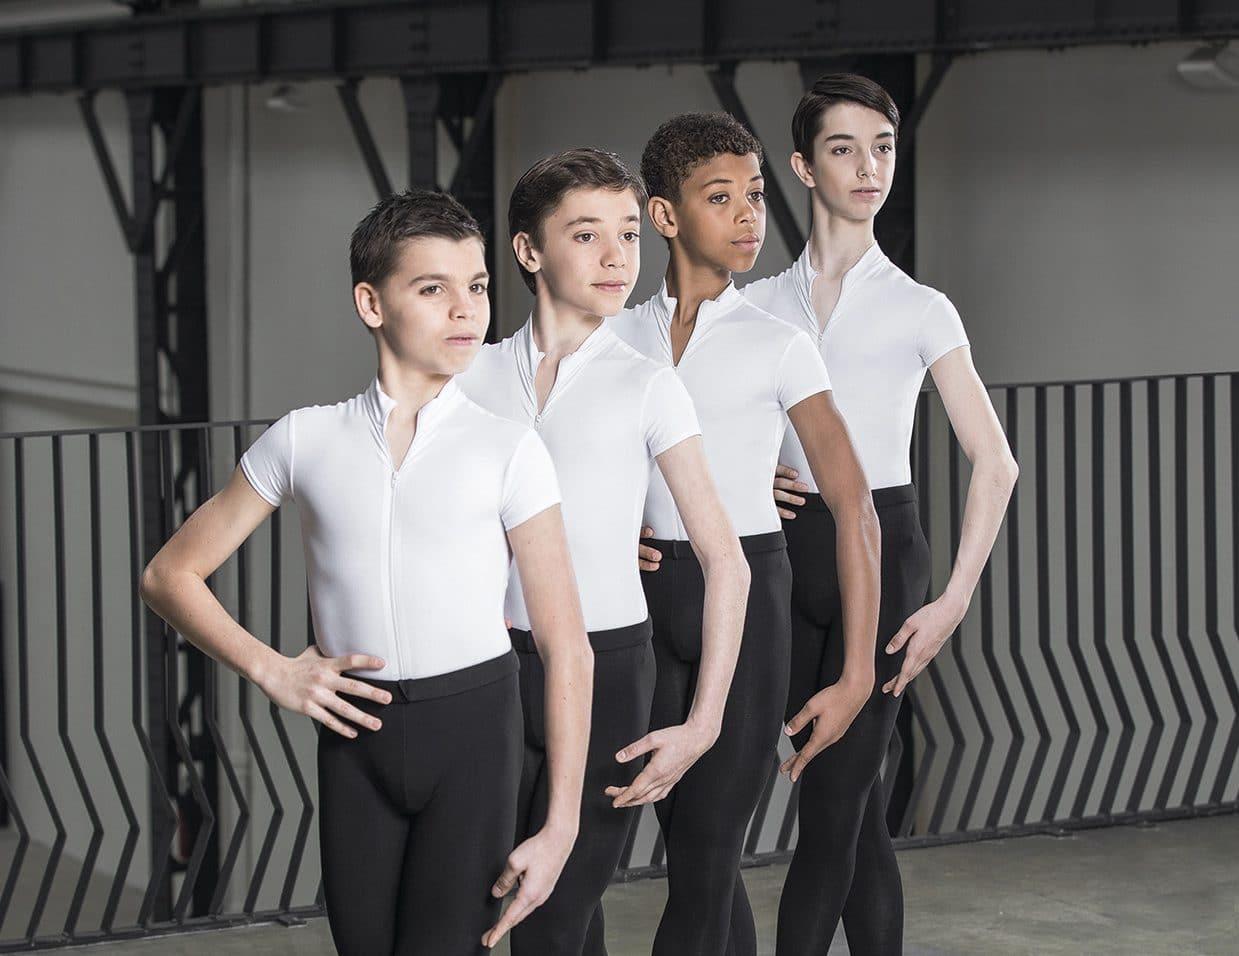 Balletkleding jongens Wear moi